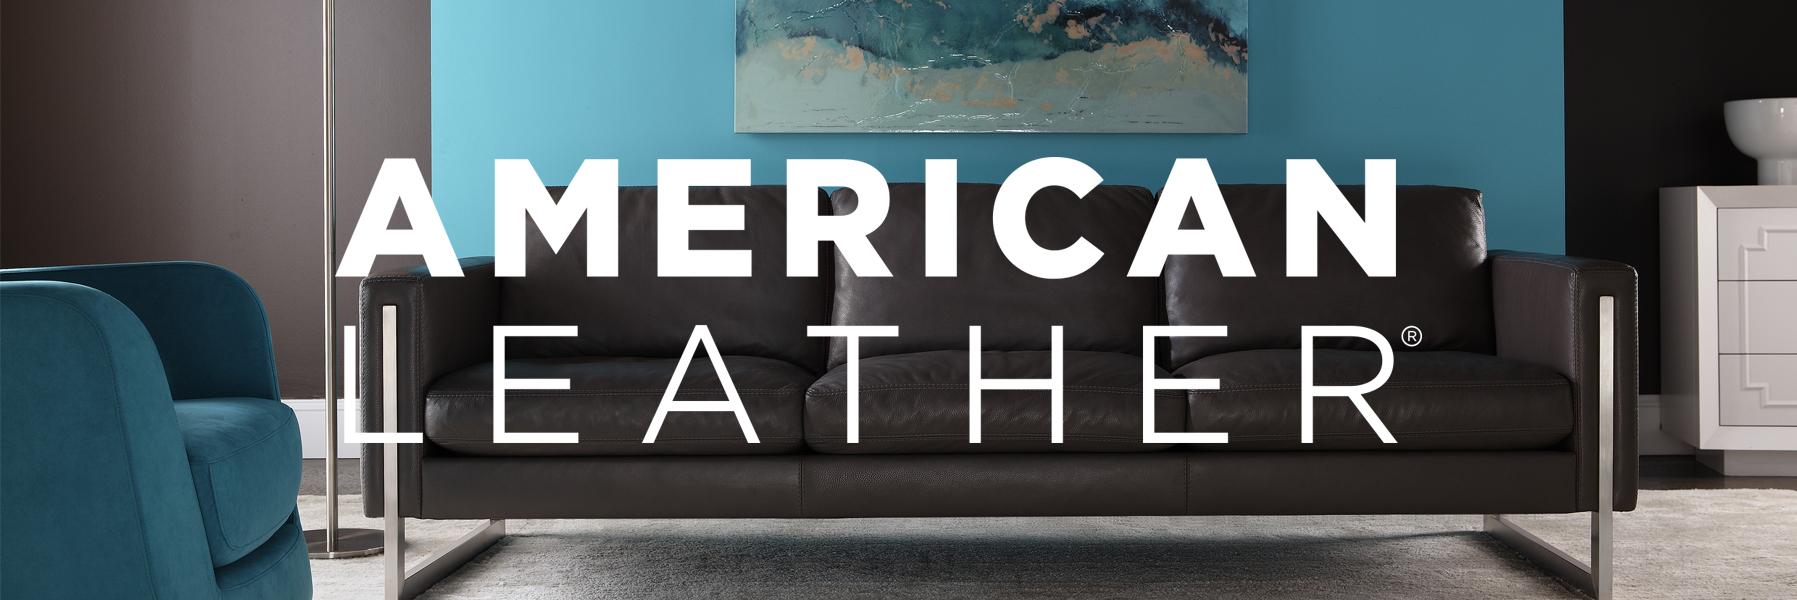 american_leather_splash_6.jpg